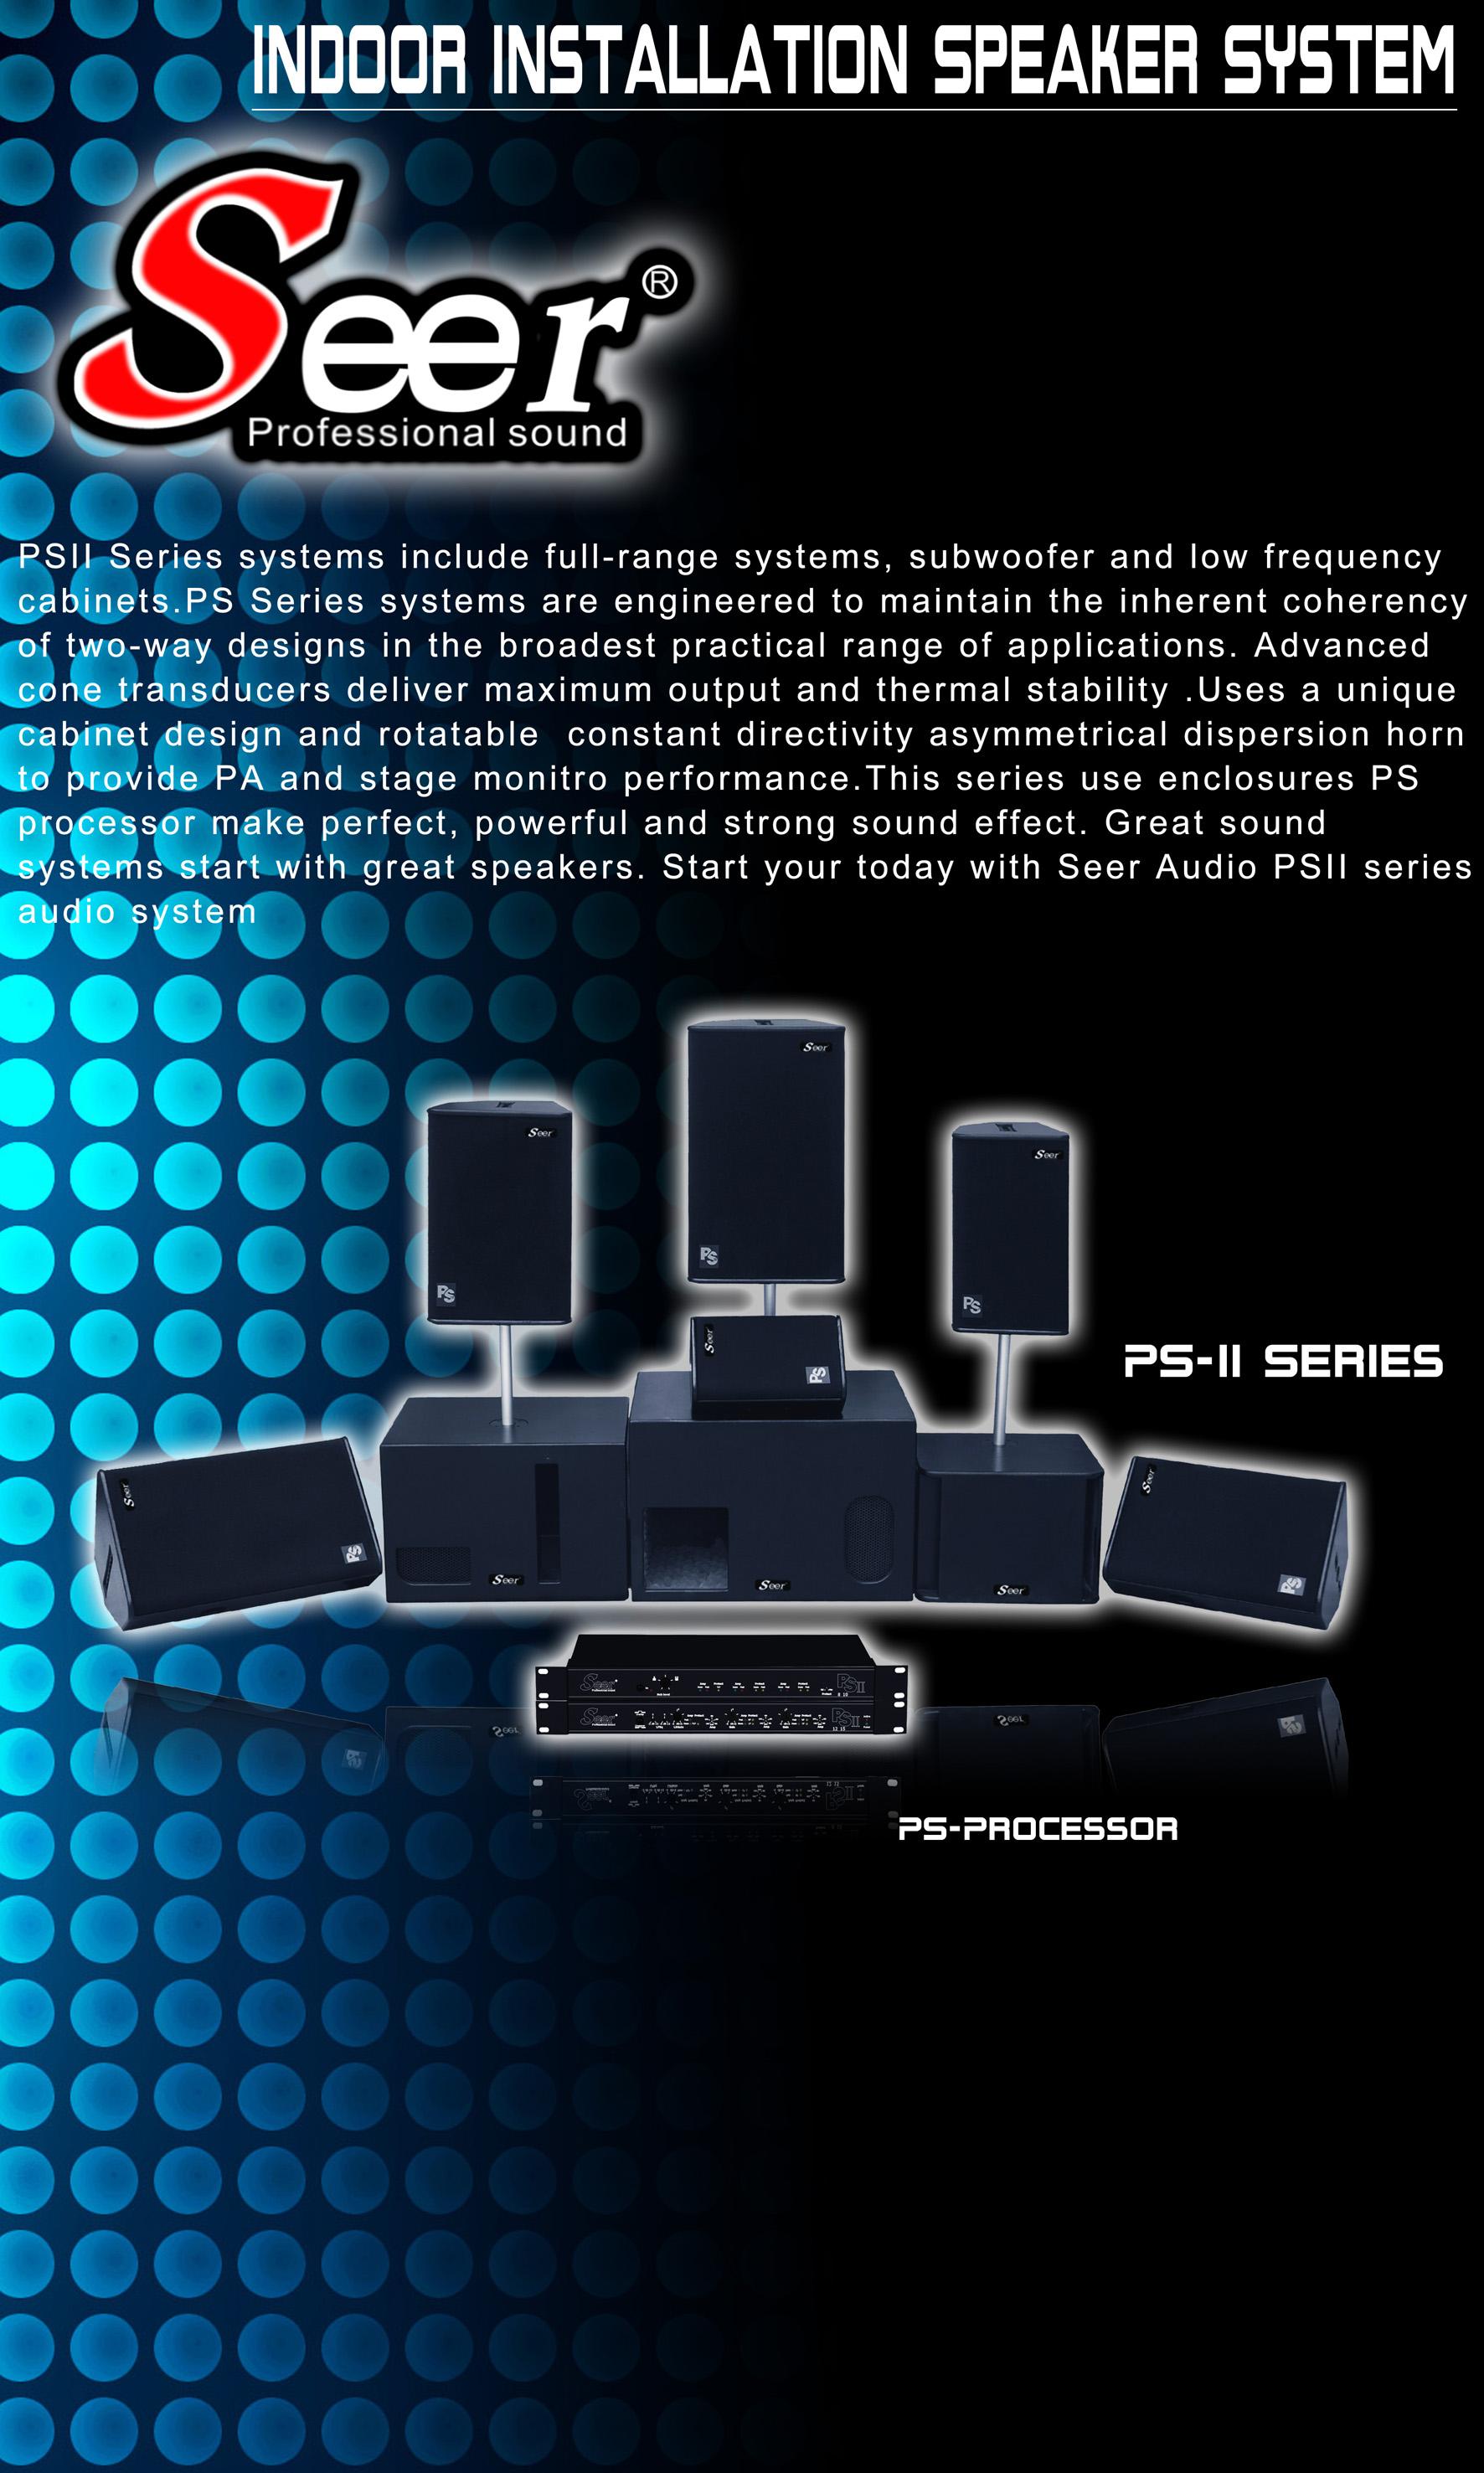 PS-II speaker